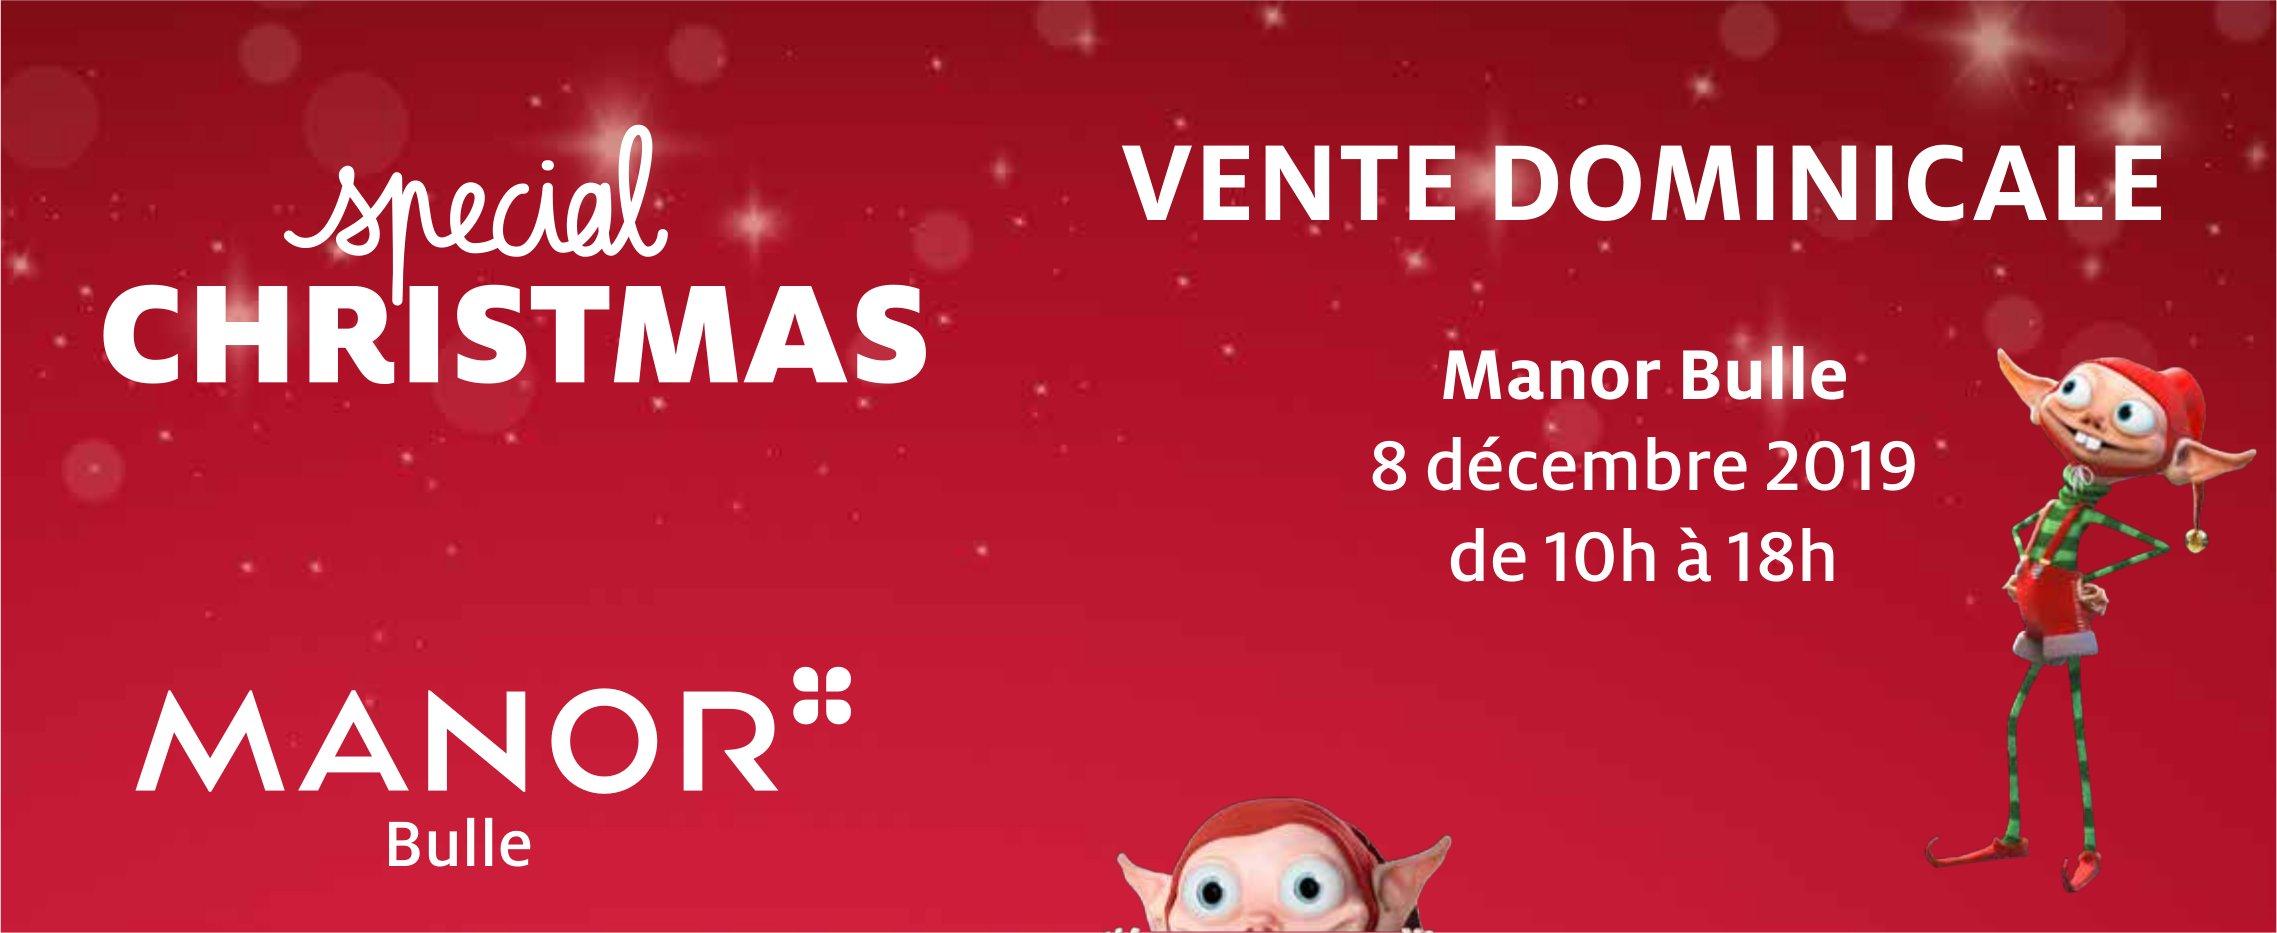 VENTE DOMINICALE SPECIAL CHRISTMAS, 8 décembre, Manor Bulle